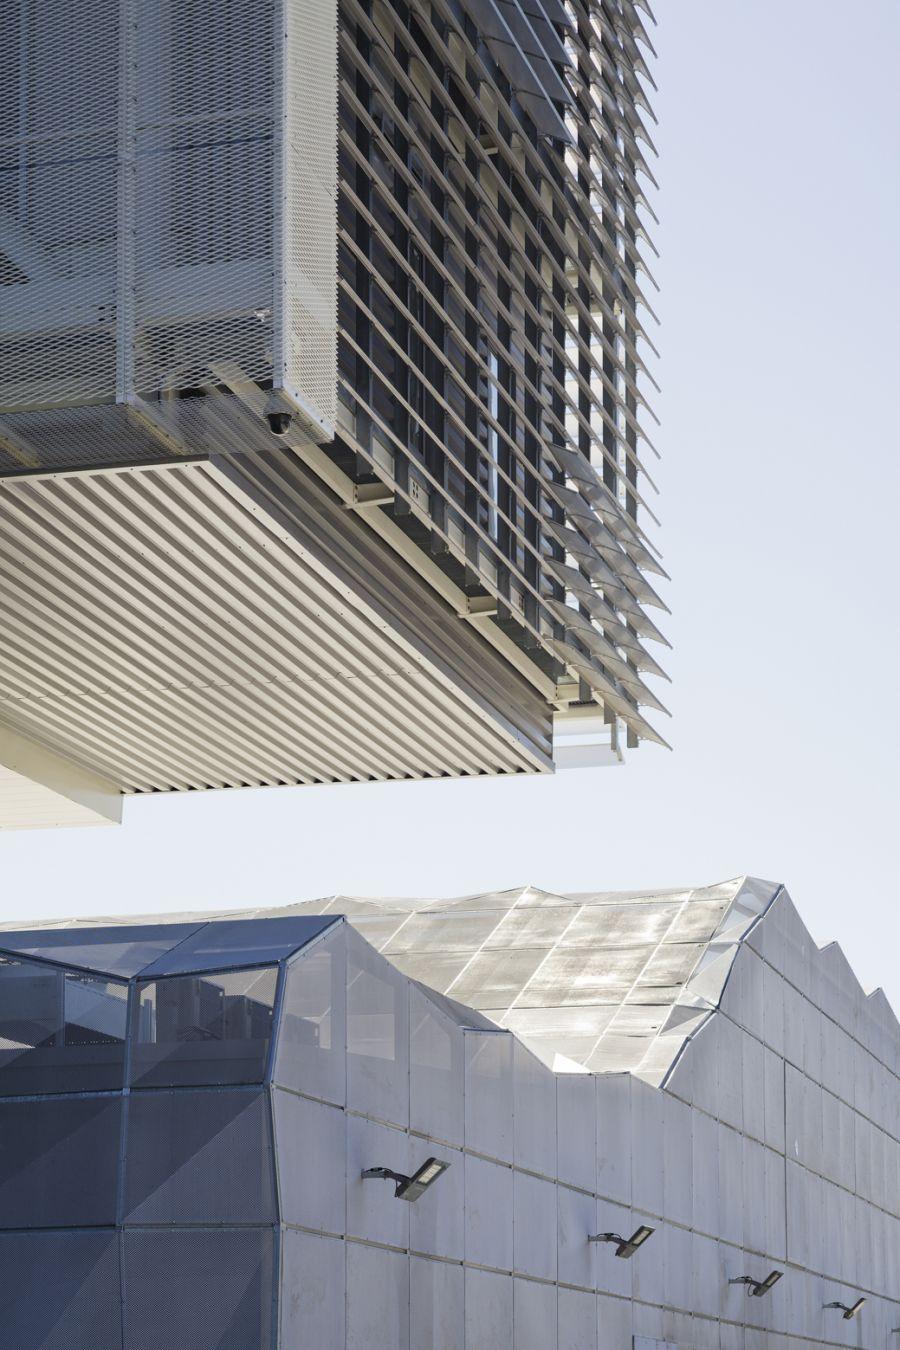 ETOILE - Arch. Block Architectes - Photo : Philippe Piron